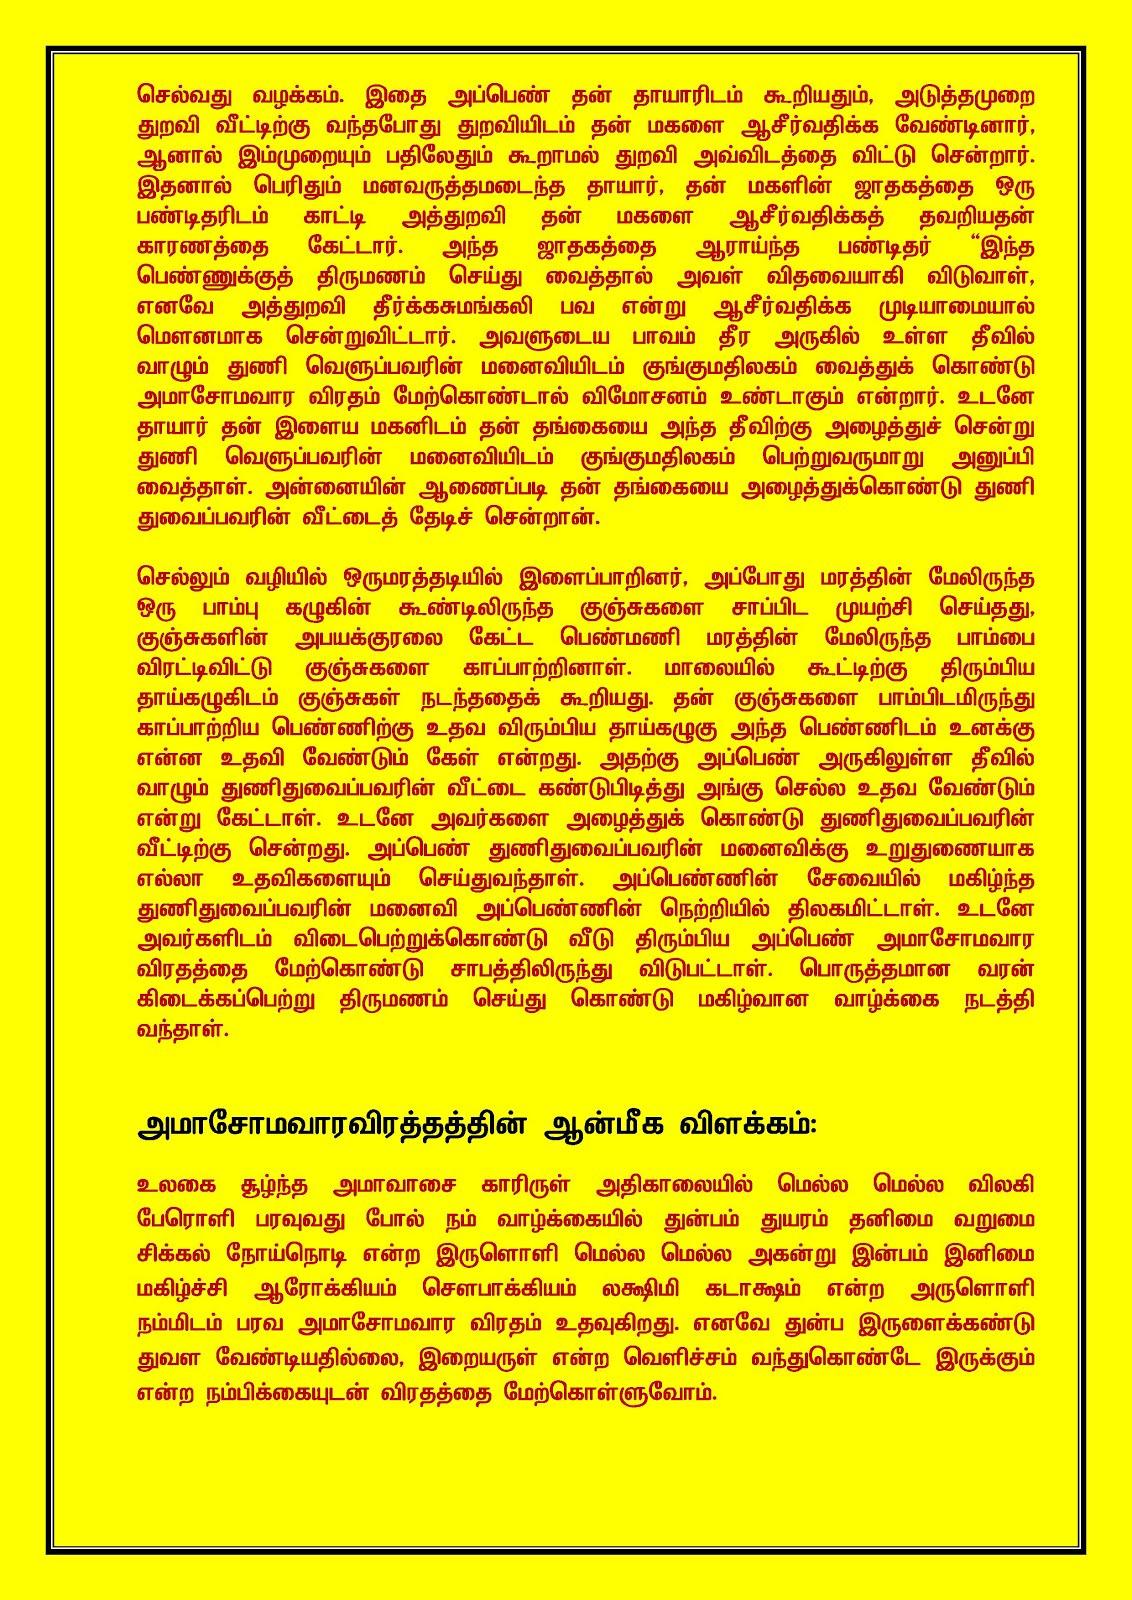 Your prayers to SHIRDI SAI BABA : Amasomavara Viratham